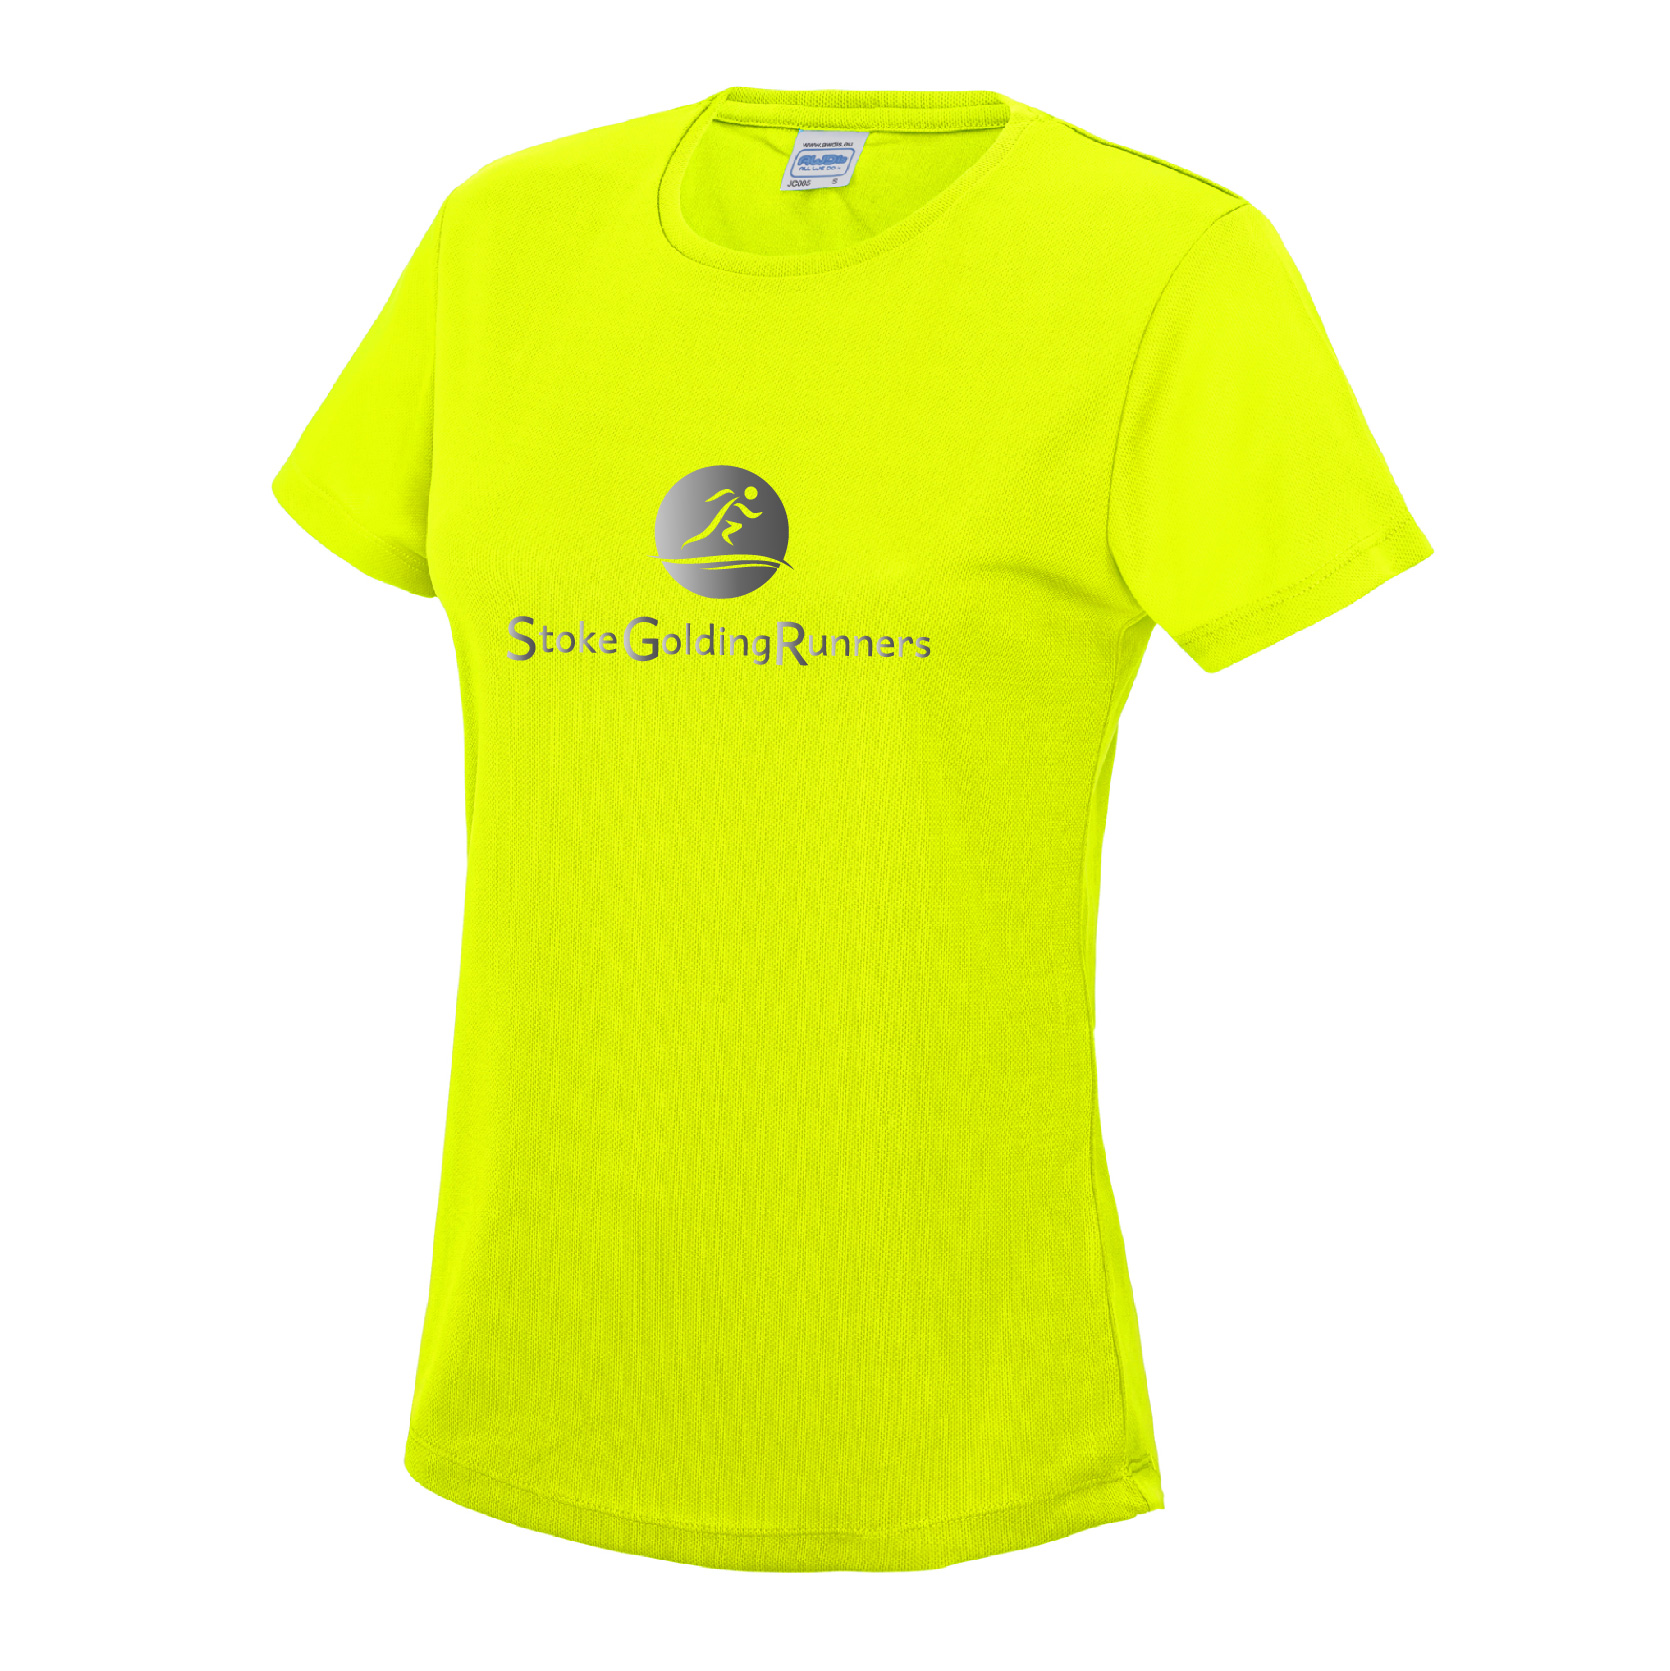 Stoke Golding Runners Hi-Viz Ladies Fit T-Shirt